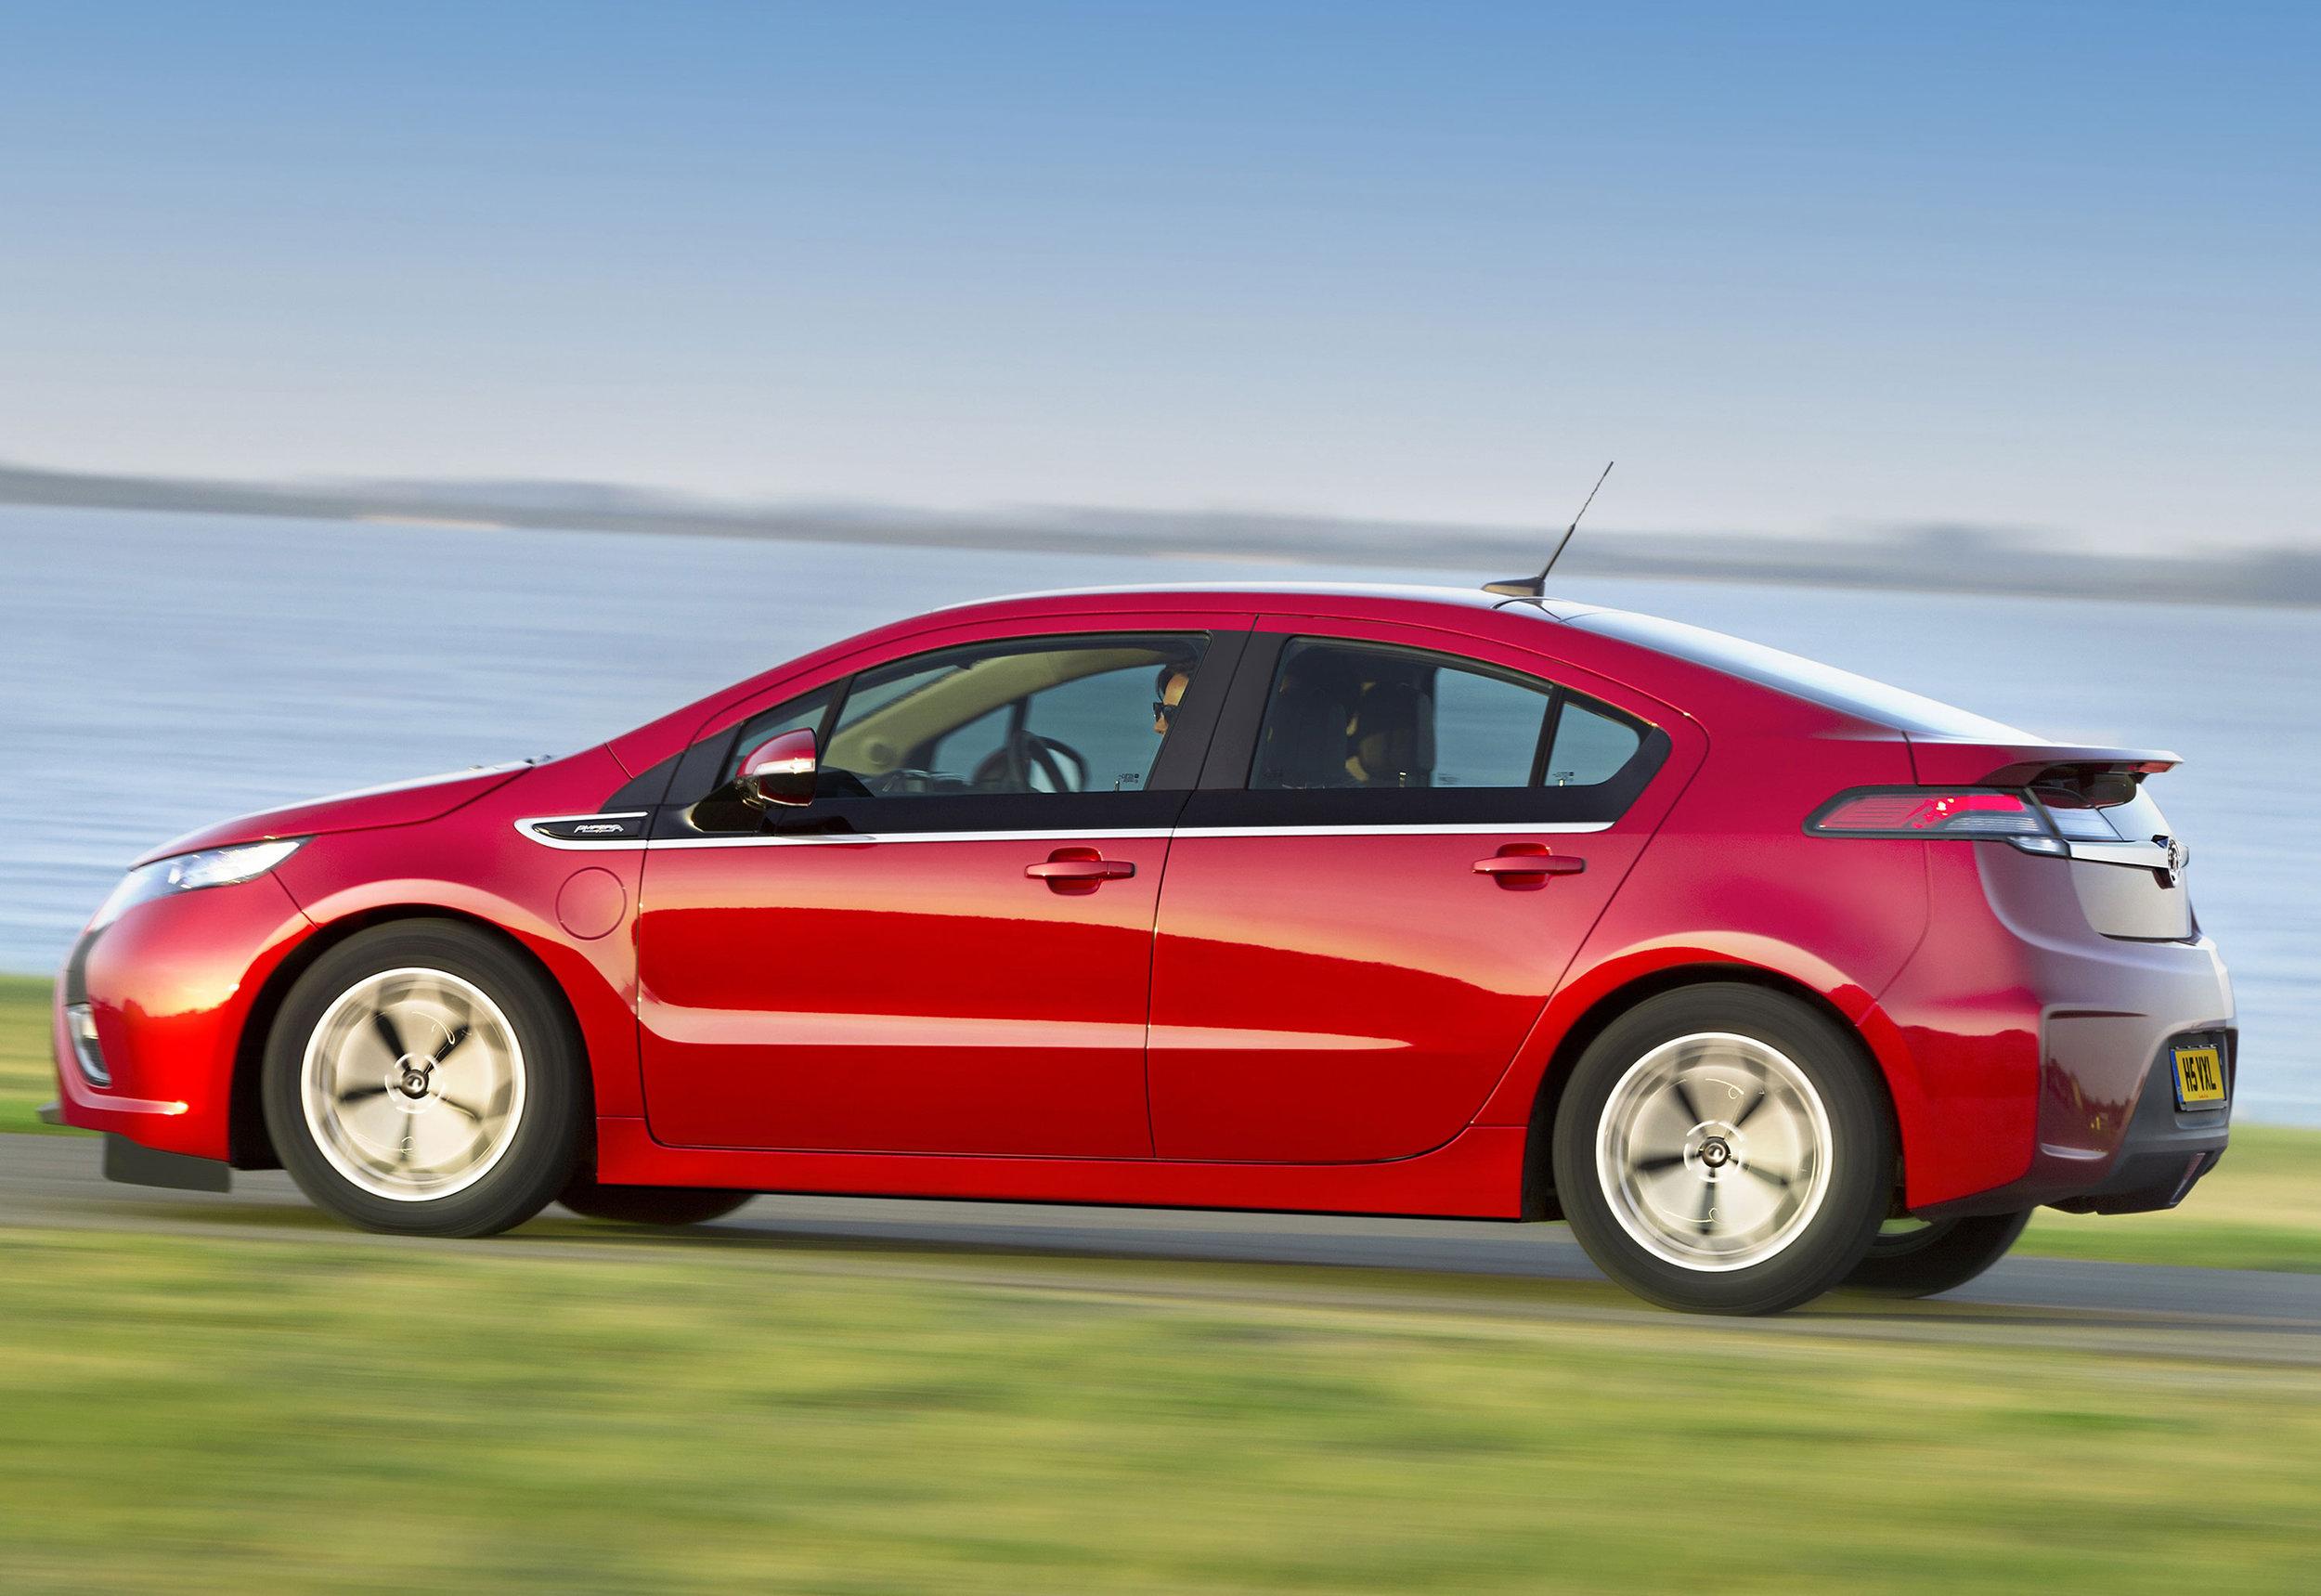 Vauxhall-Ampera-09.jpg